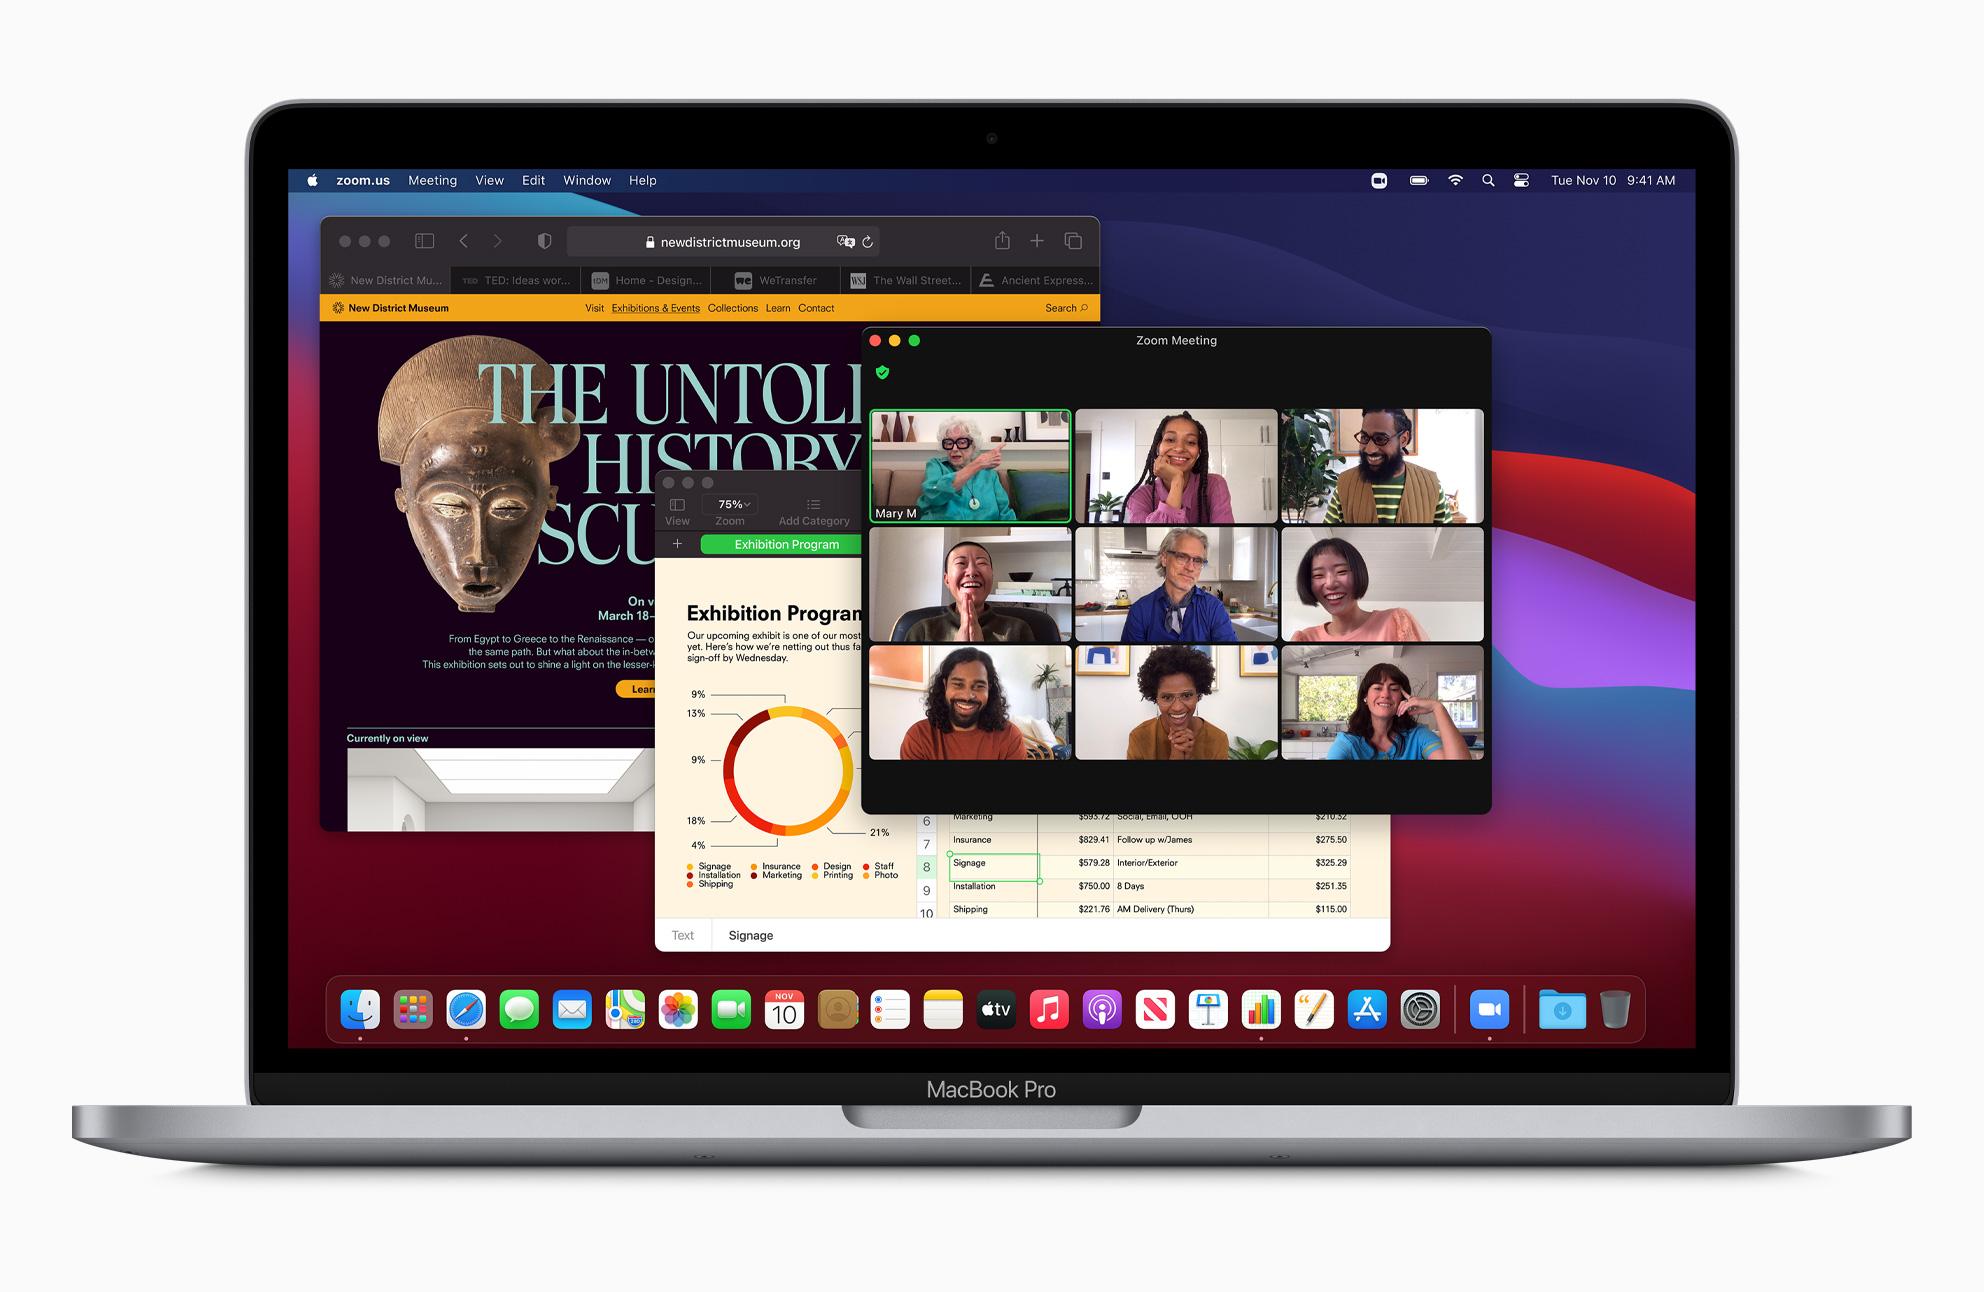 MacBook Pro 13-inch M1 image